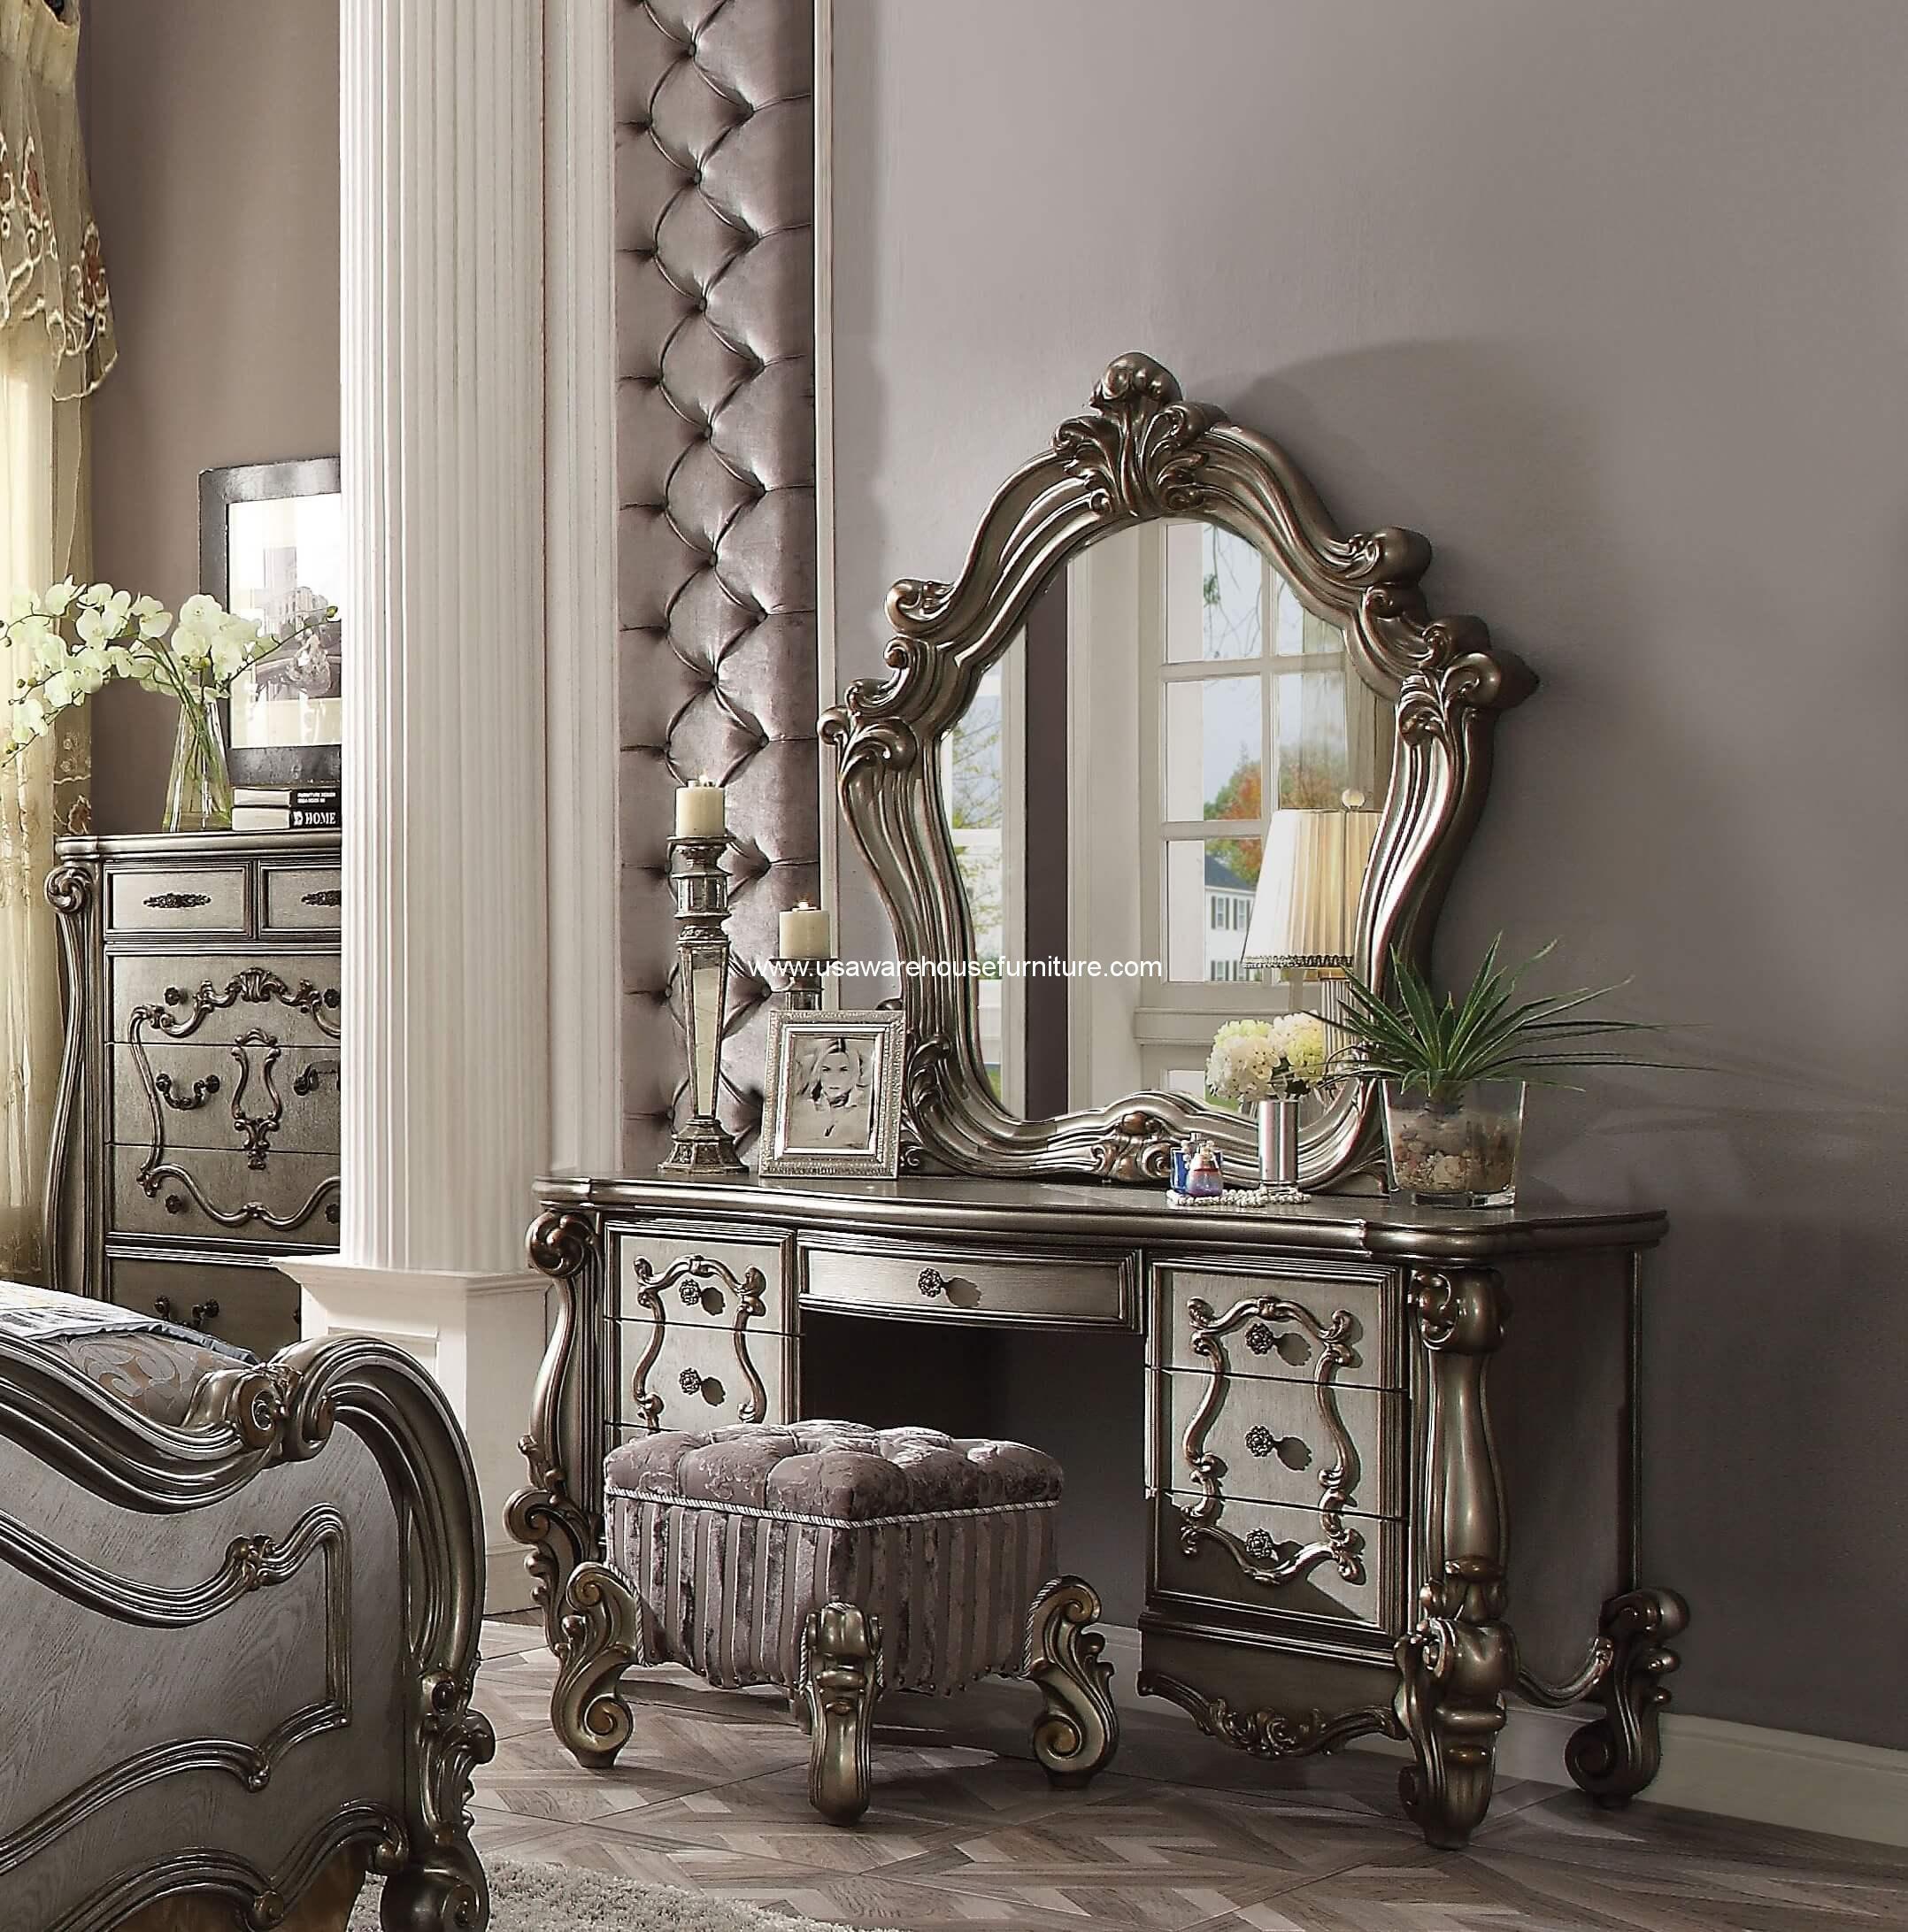 3 Piece Versailles Vanity Mirror With Stool Antique